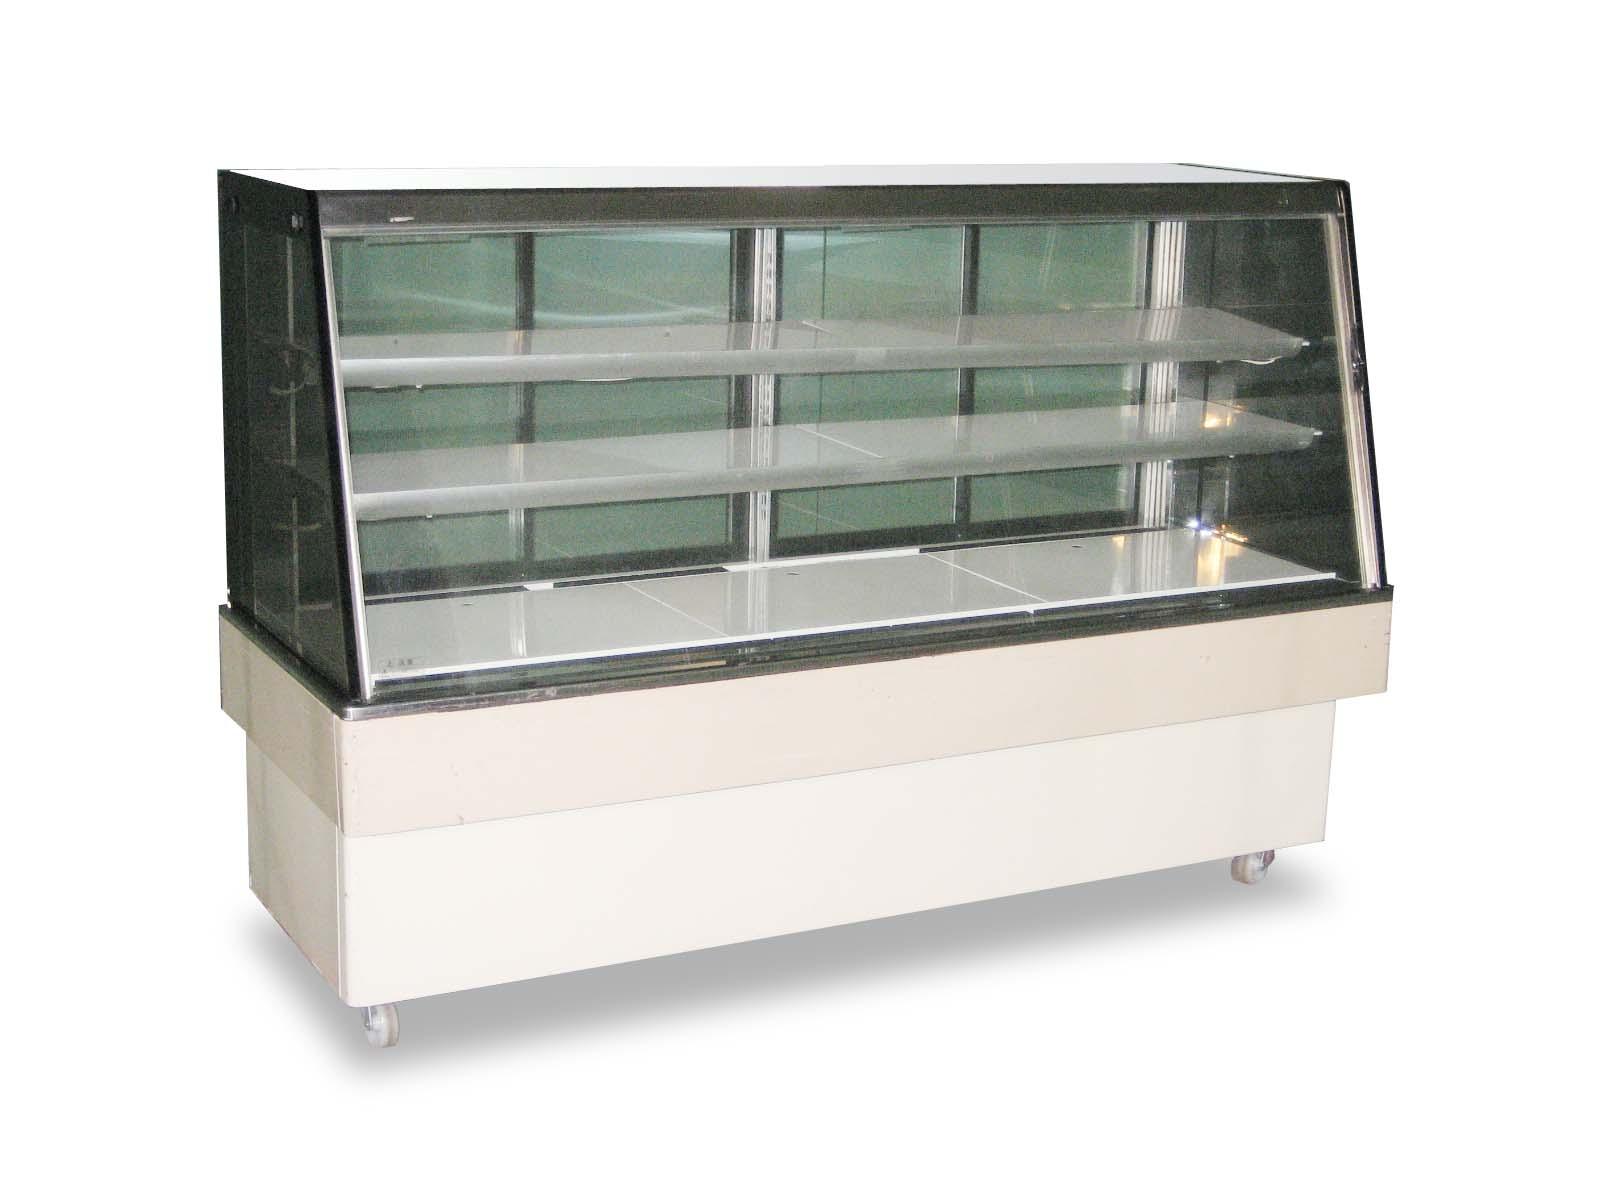 冷蔵斜面ケースW1800